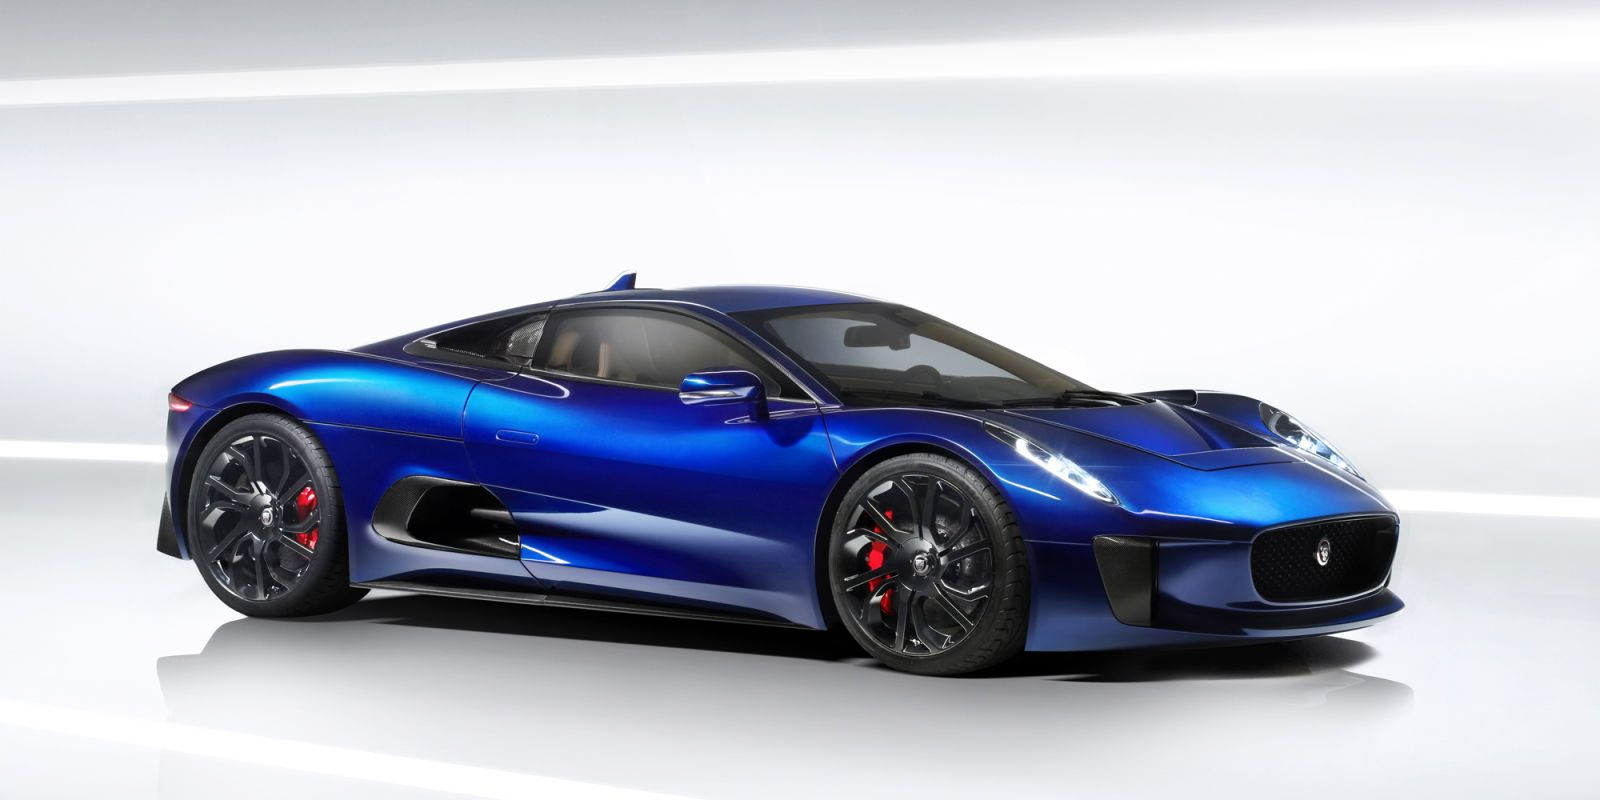 The New Bond Villain Car Isn T New But It Is Gorgeous Sports Car Super Cars Jaguar